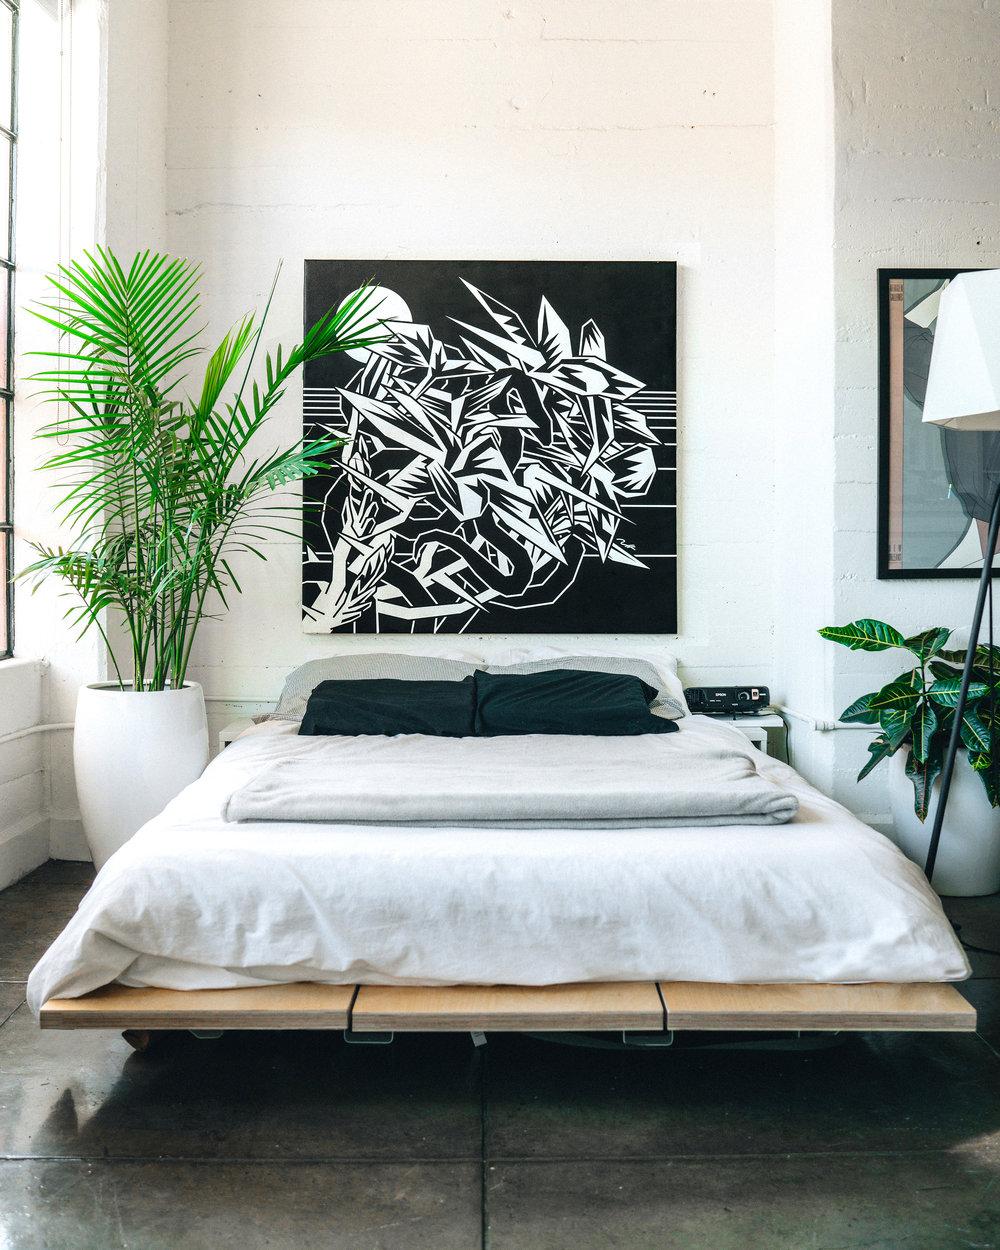 Tommii Lim - Black Mamba Prints Bed_72.jpg